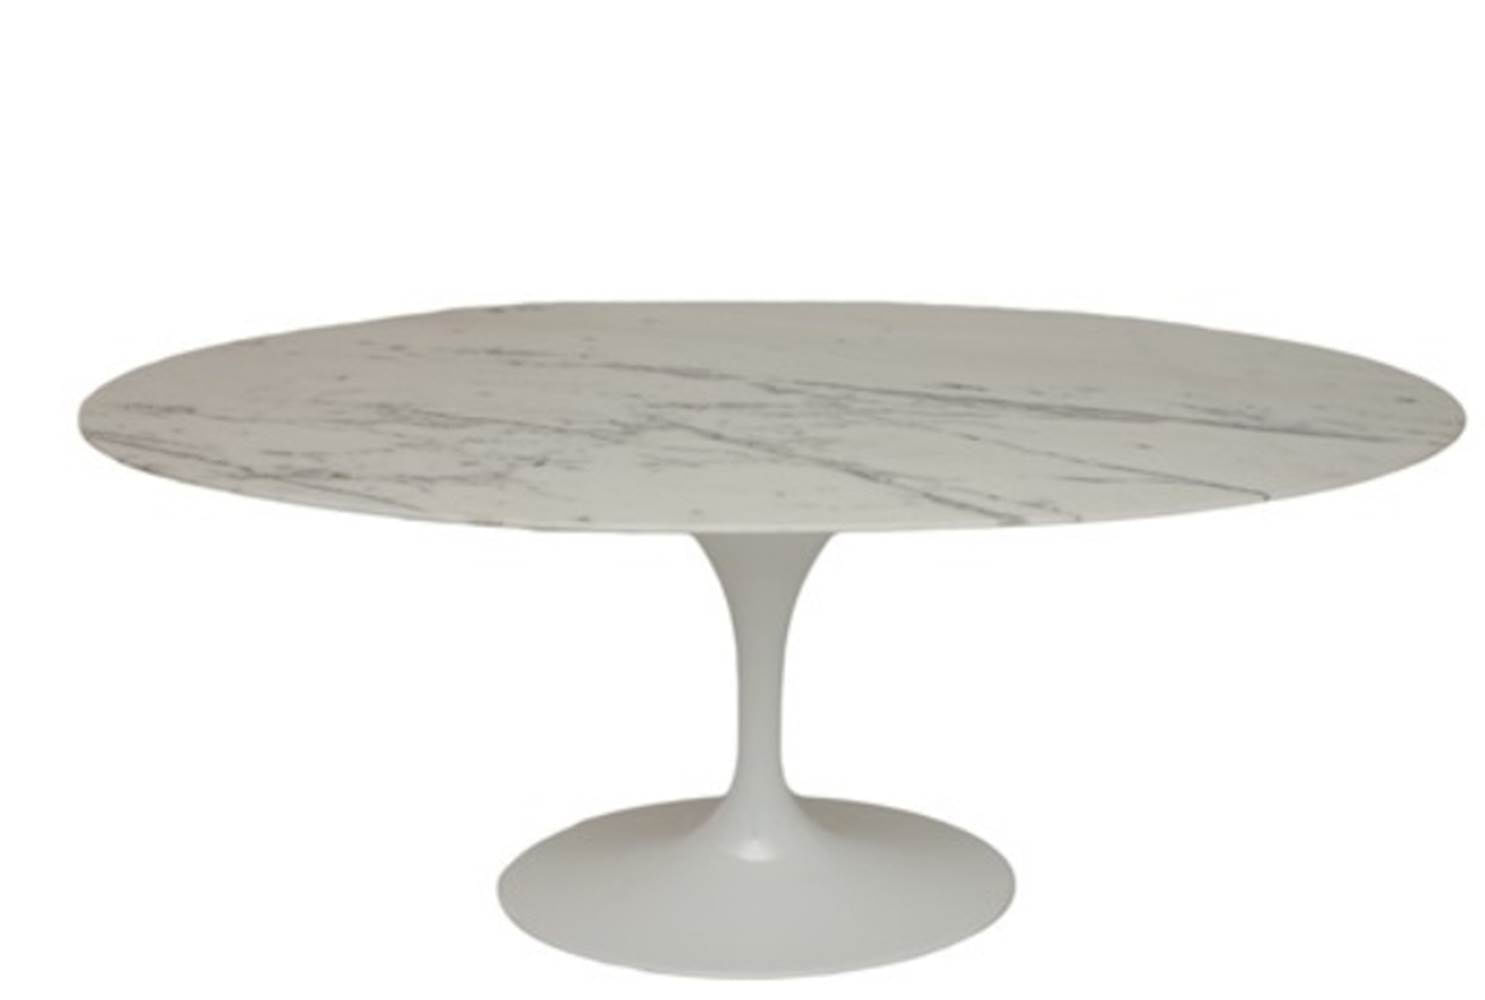 Mesa Jantar Saarinen Oval 198x122 M. Venatto Branco - 8312